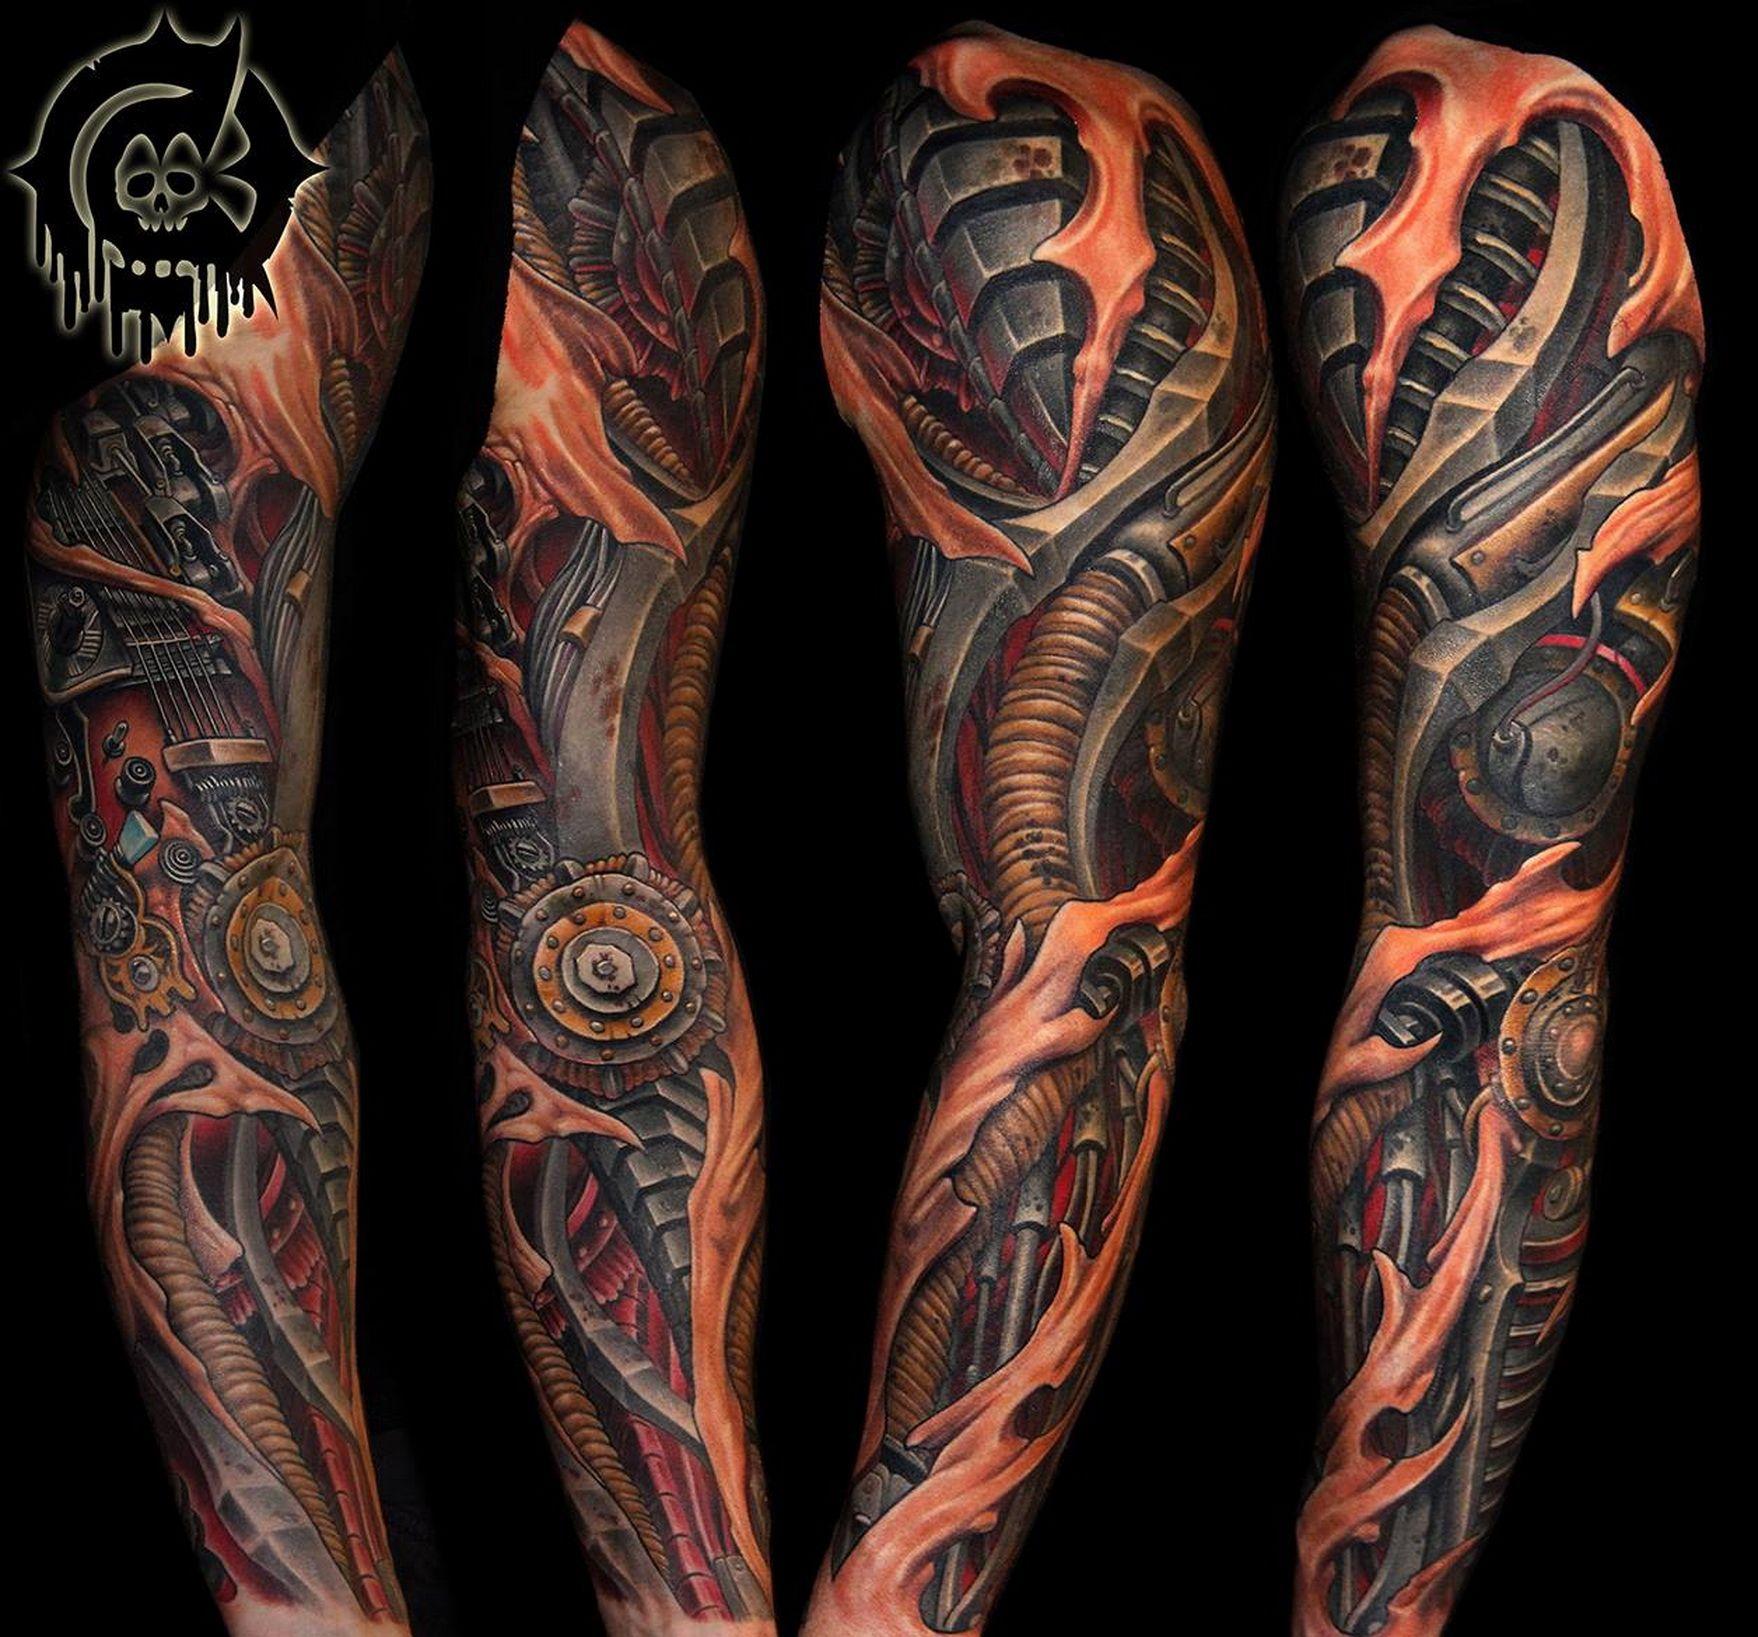 Biomechanical Tattoo Sleeve Julian Siebert Biomechanical inside proportions 1758 X 1637